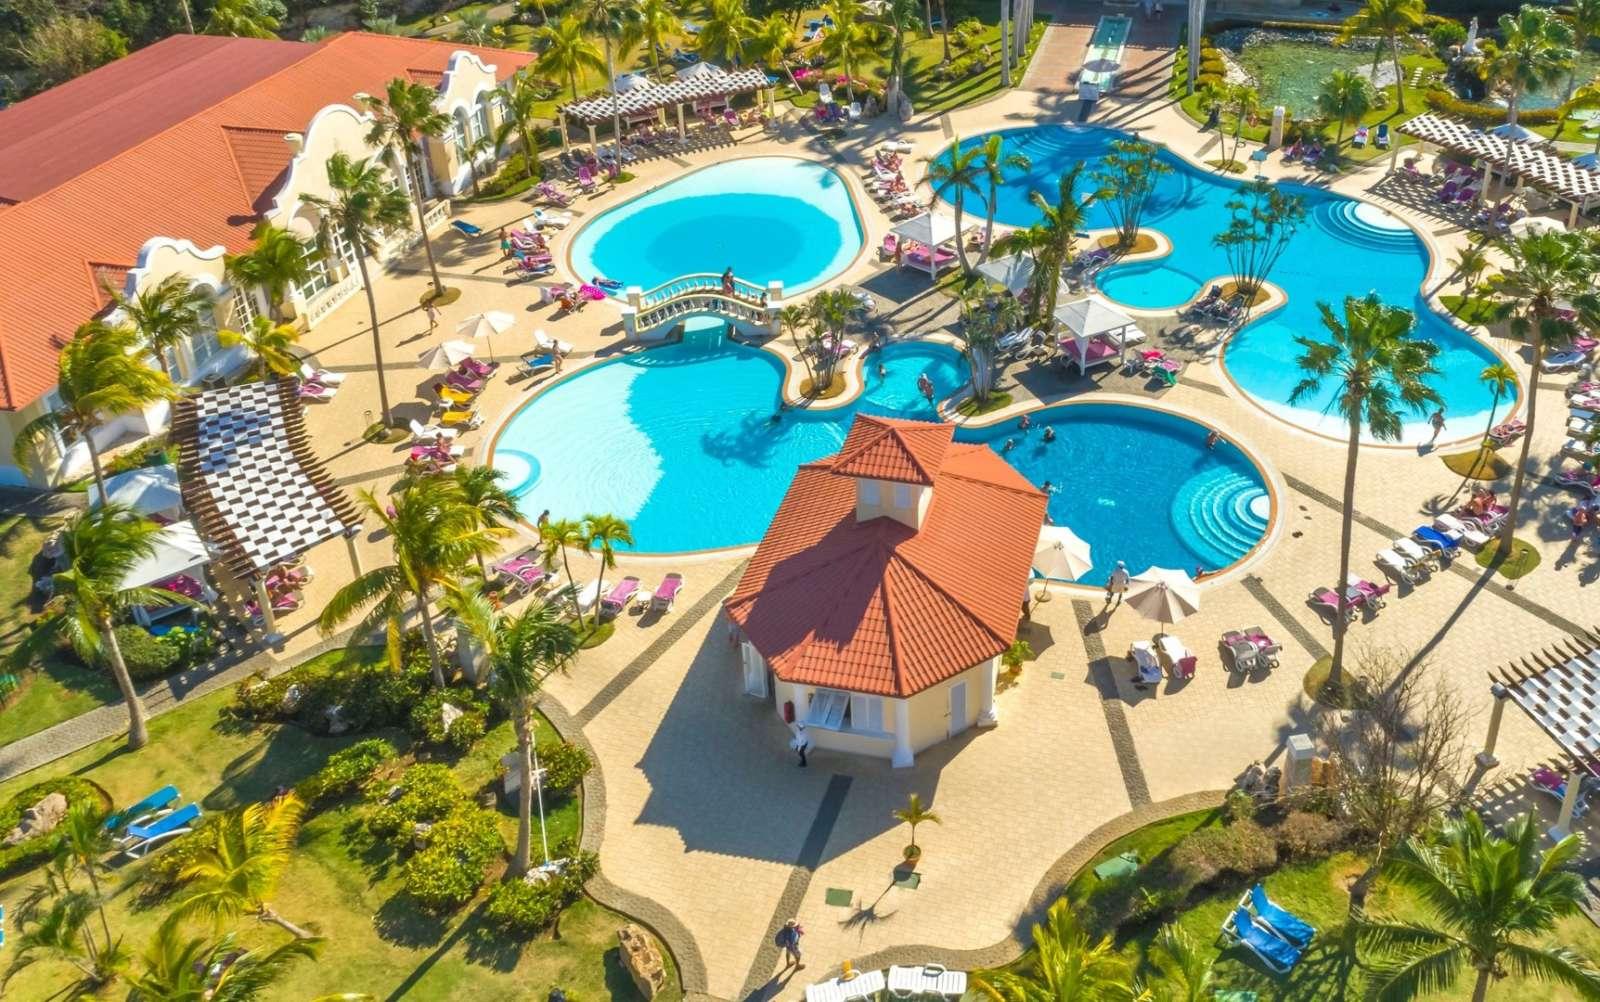 Aerial view of pool at Paradisus Princesa Varadero